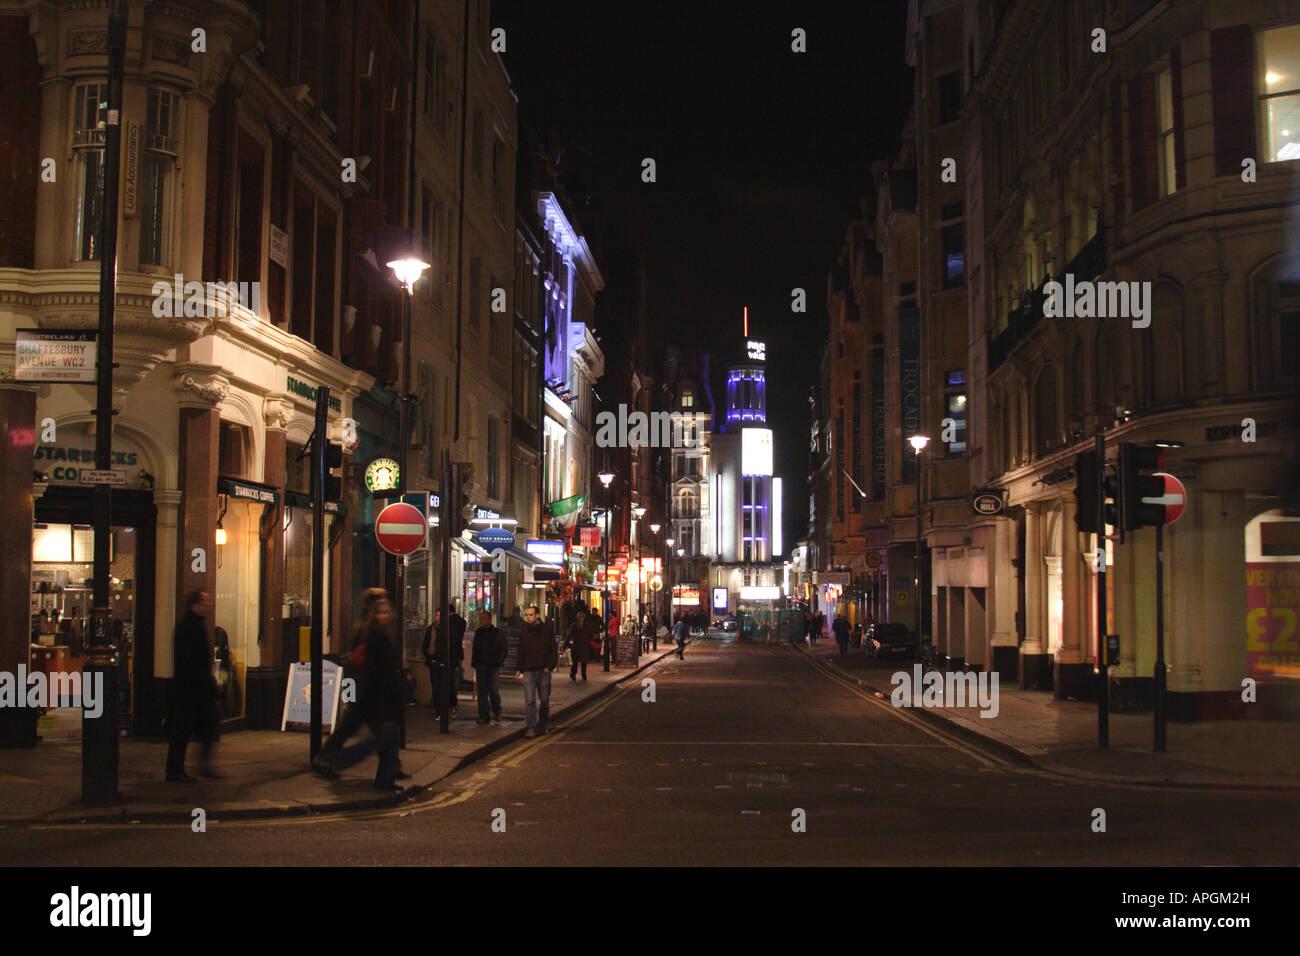 Street scene Shaftesbury Avenue London at night January 2008 - Stock Image